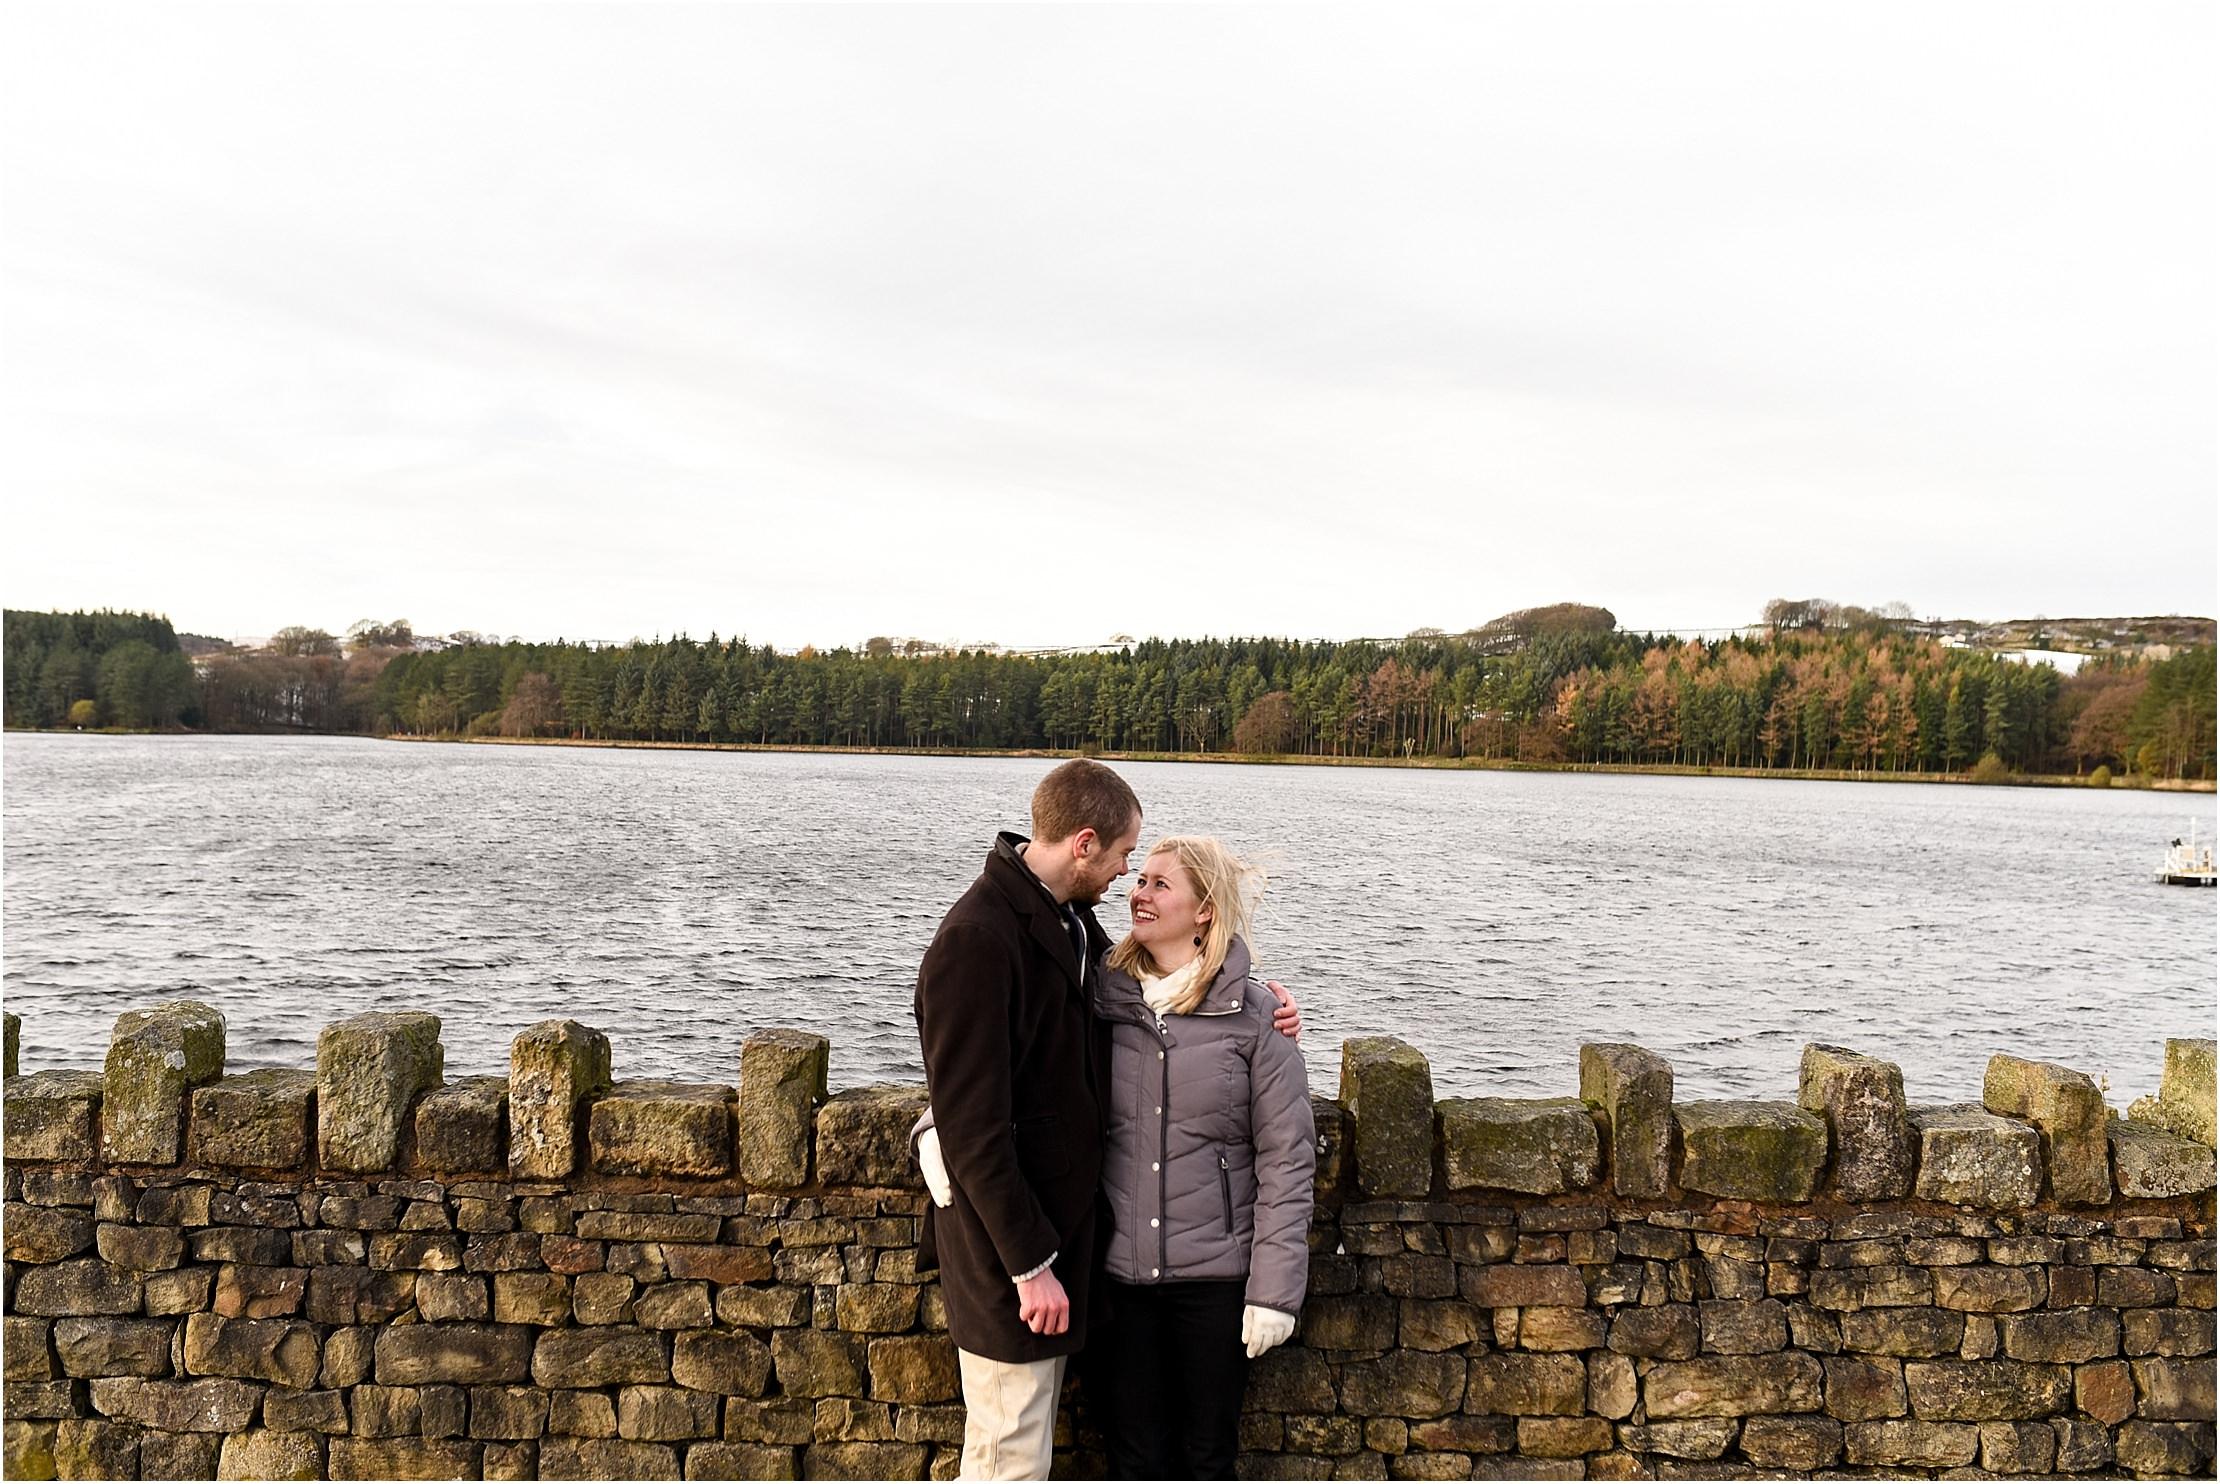 entwistle-reservoir-pre-wedding-21.jpg